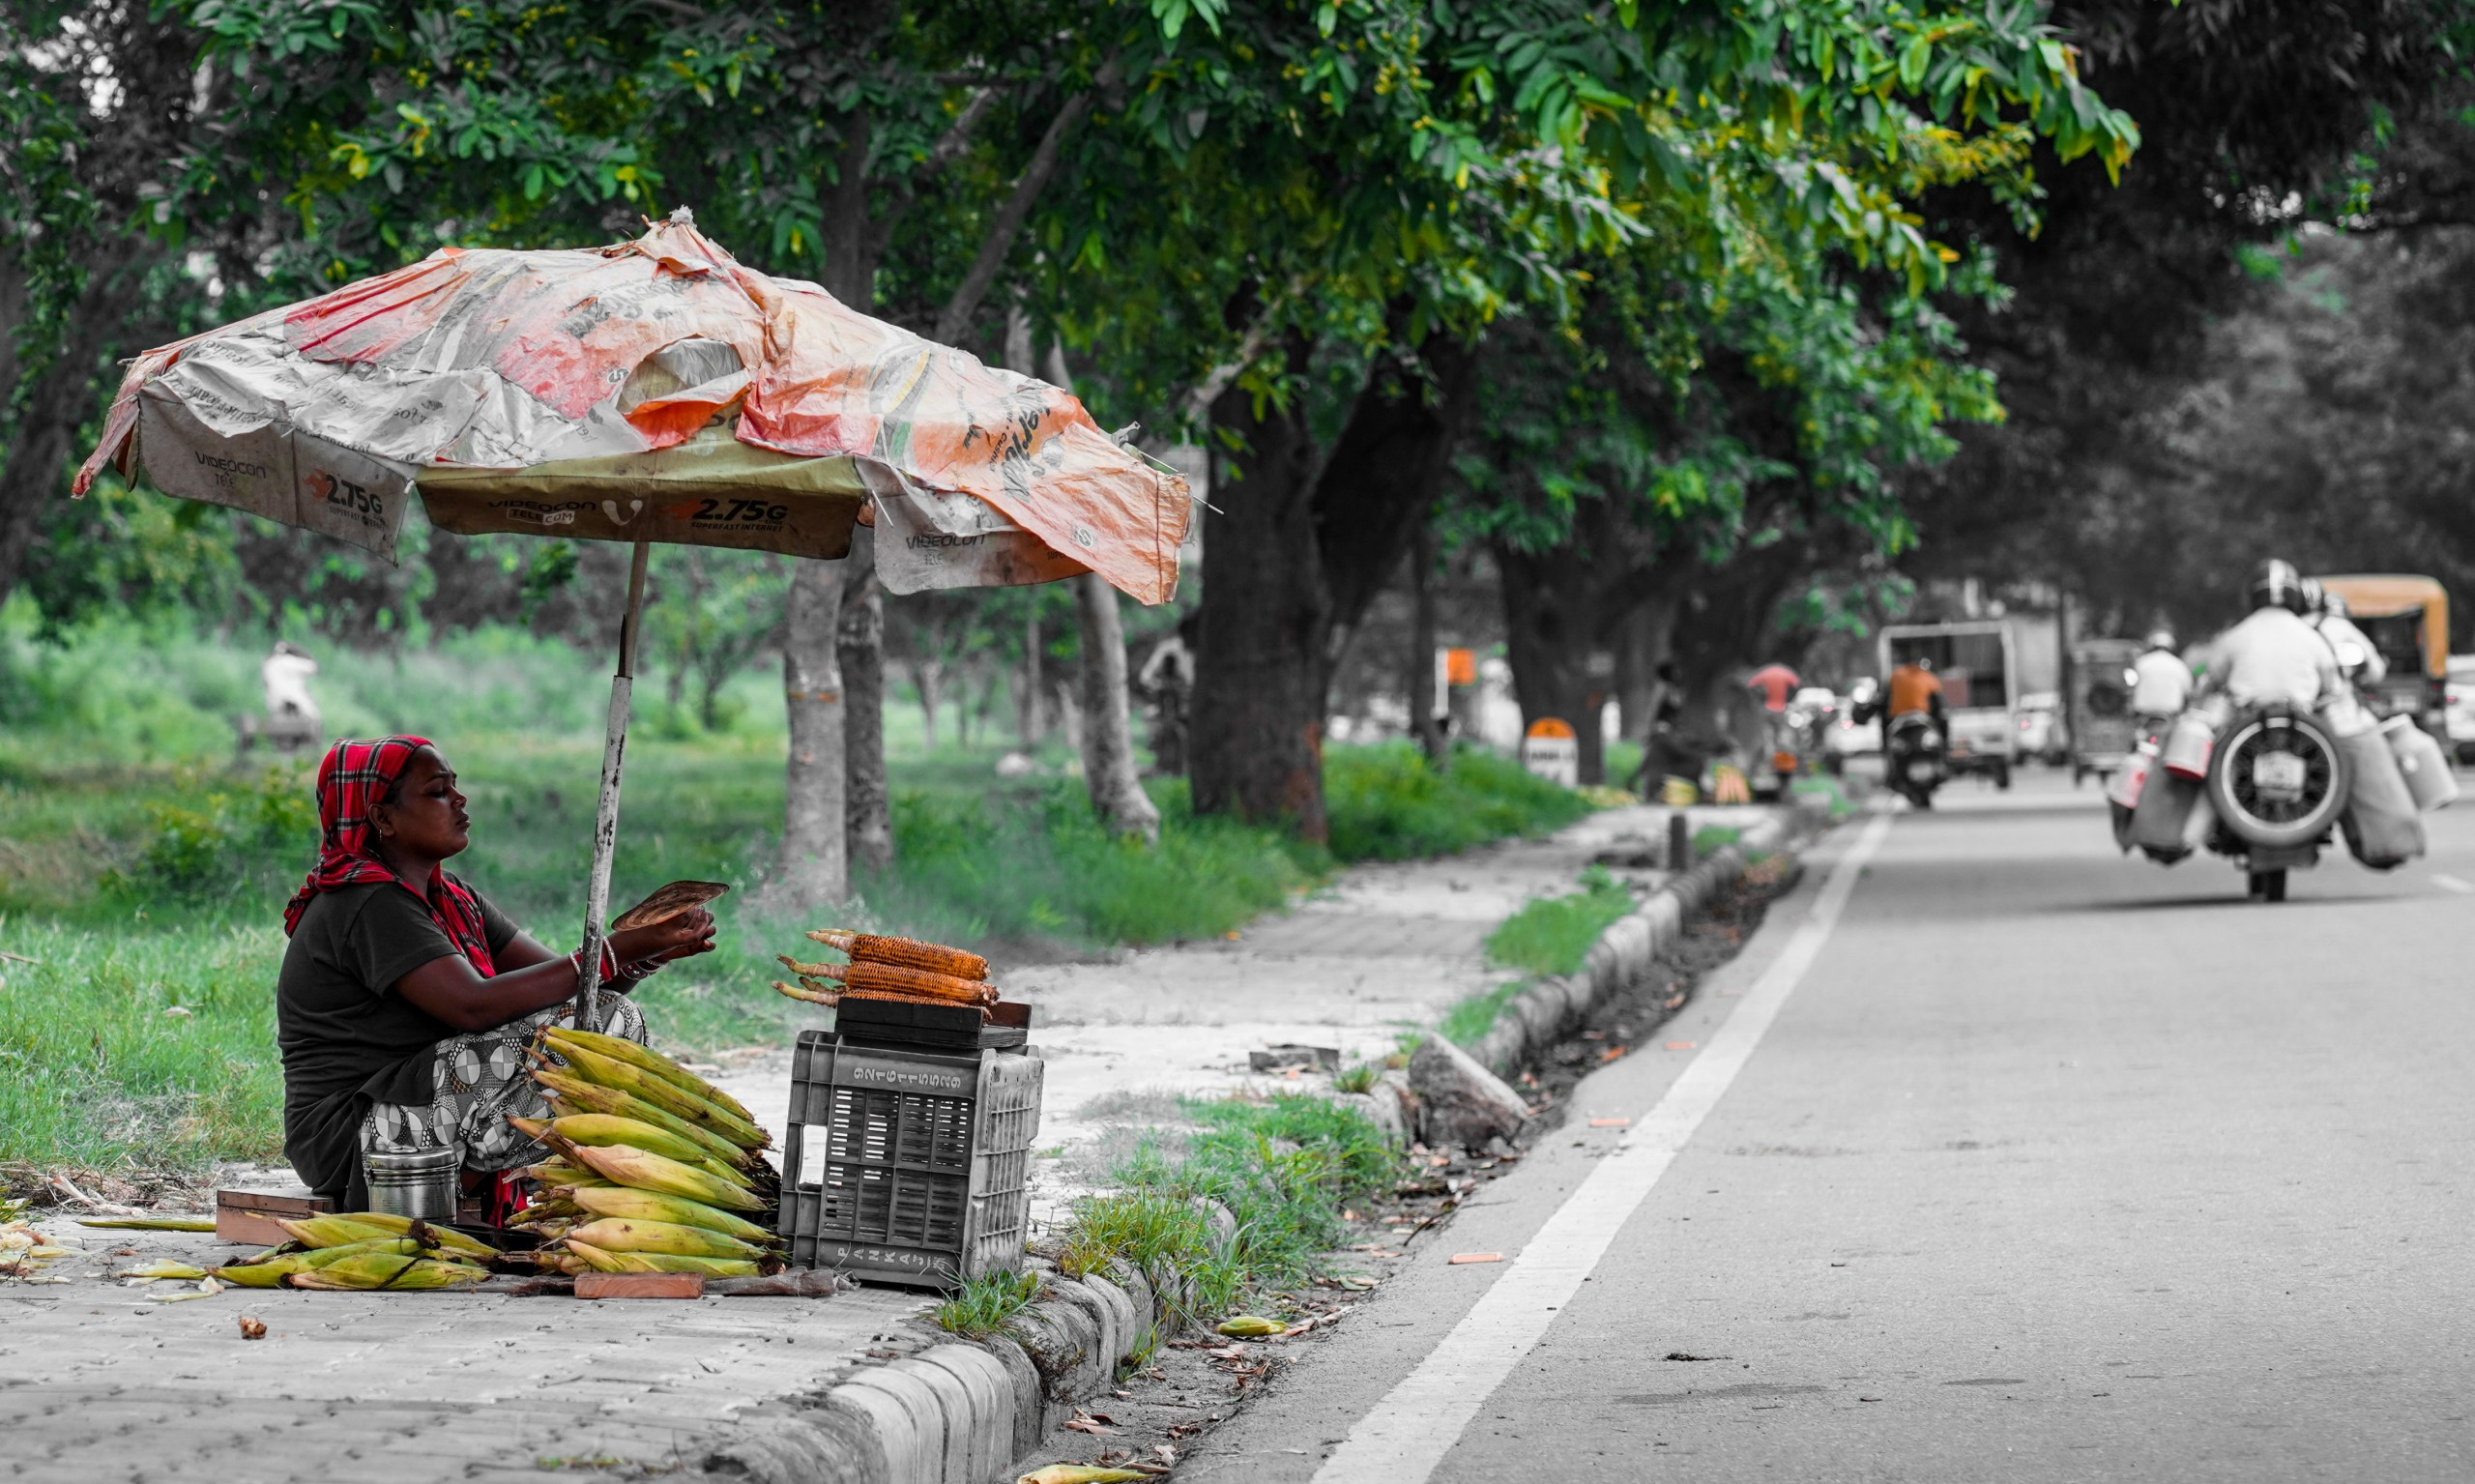 Street Corn Vendor